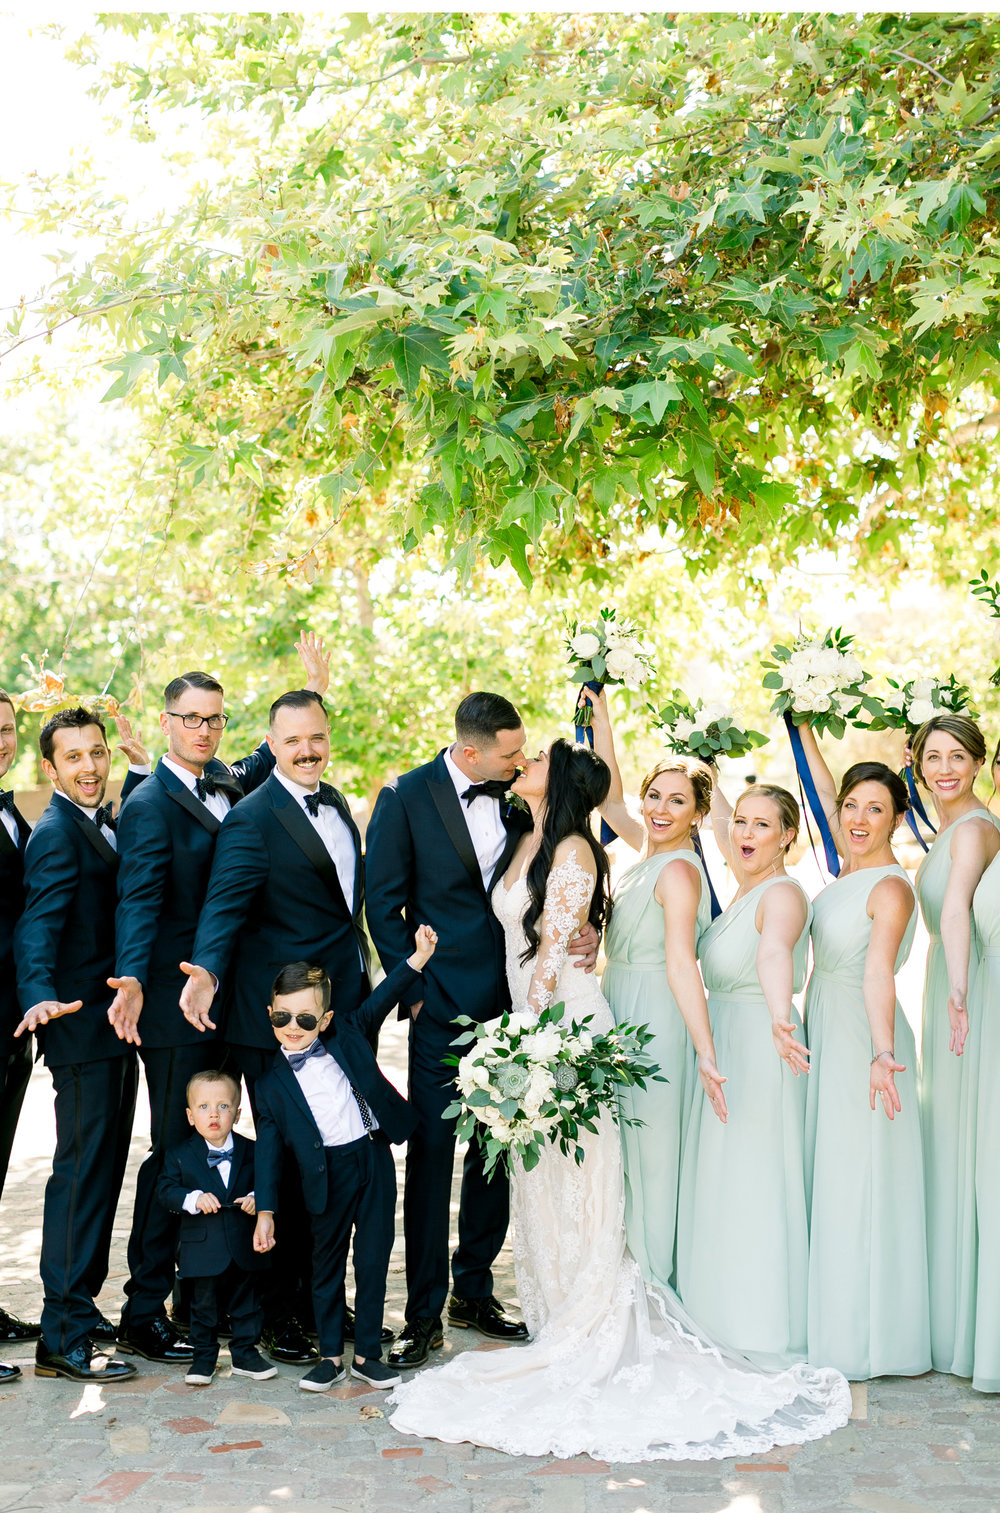 Southern-California-Weddings-Natalie-Schutt-Photography-Weddings_12.jpg